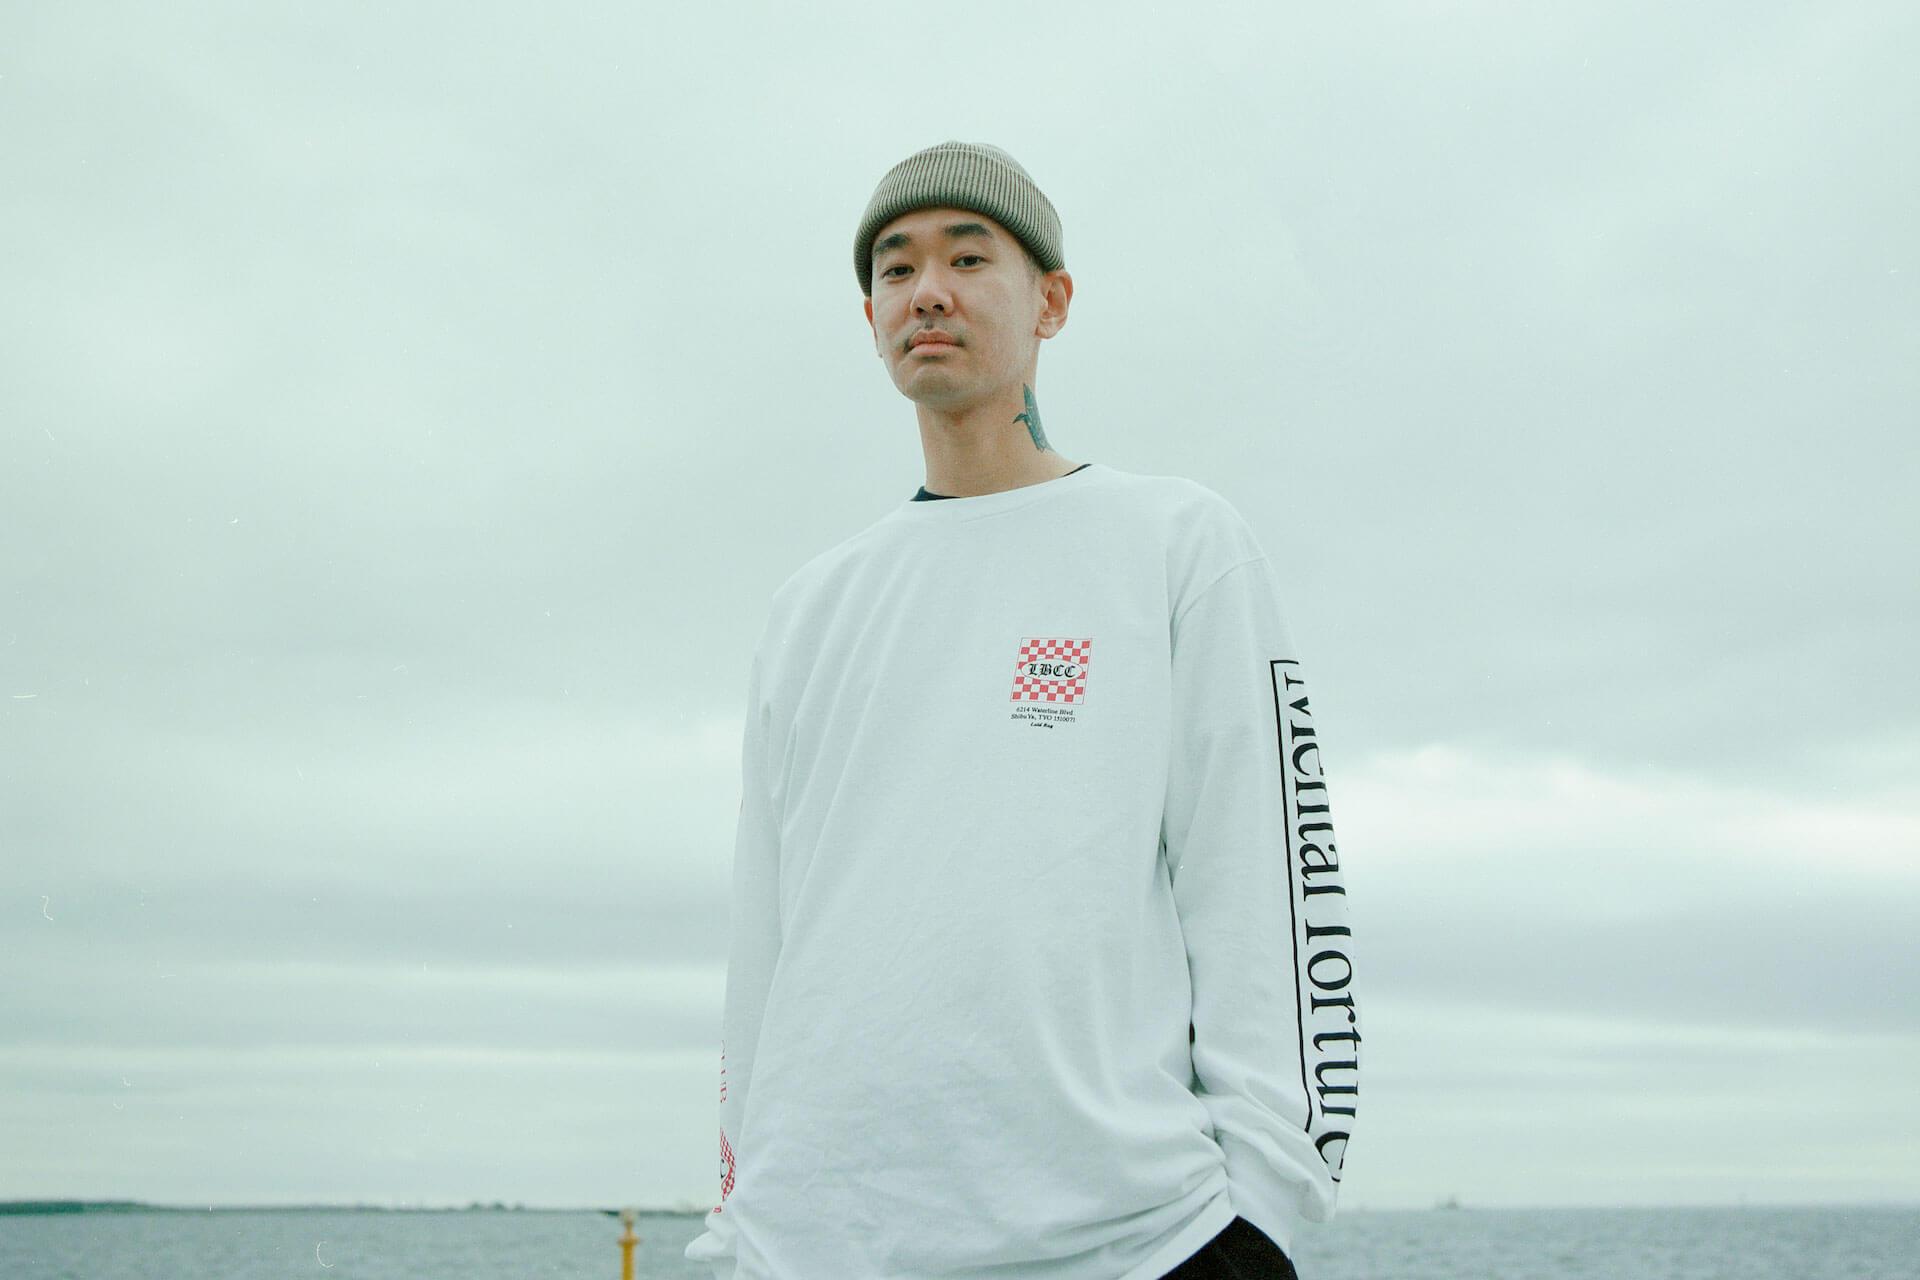 "KMによるニューアルバム『EVERYTHING INSIDE』がリリース決定!""Distortion(feat. 田我流)""が明日先行配信 music210525_km_1"